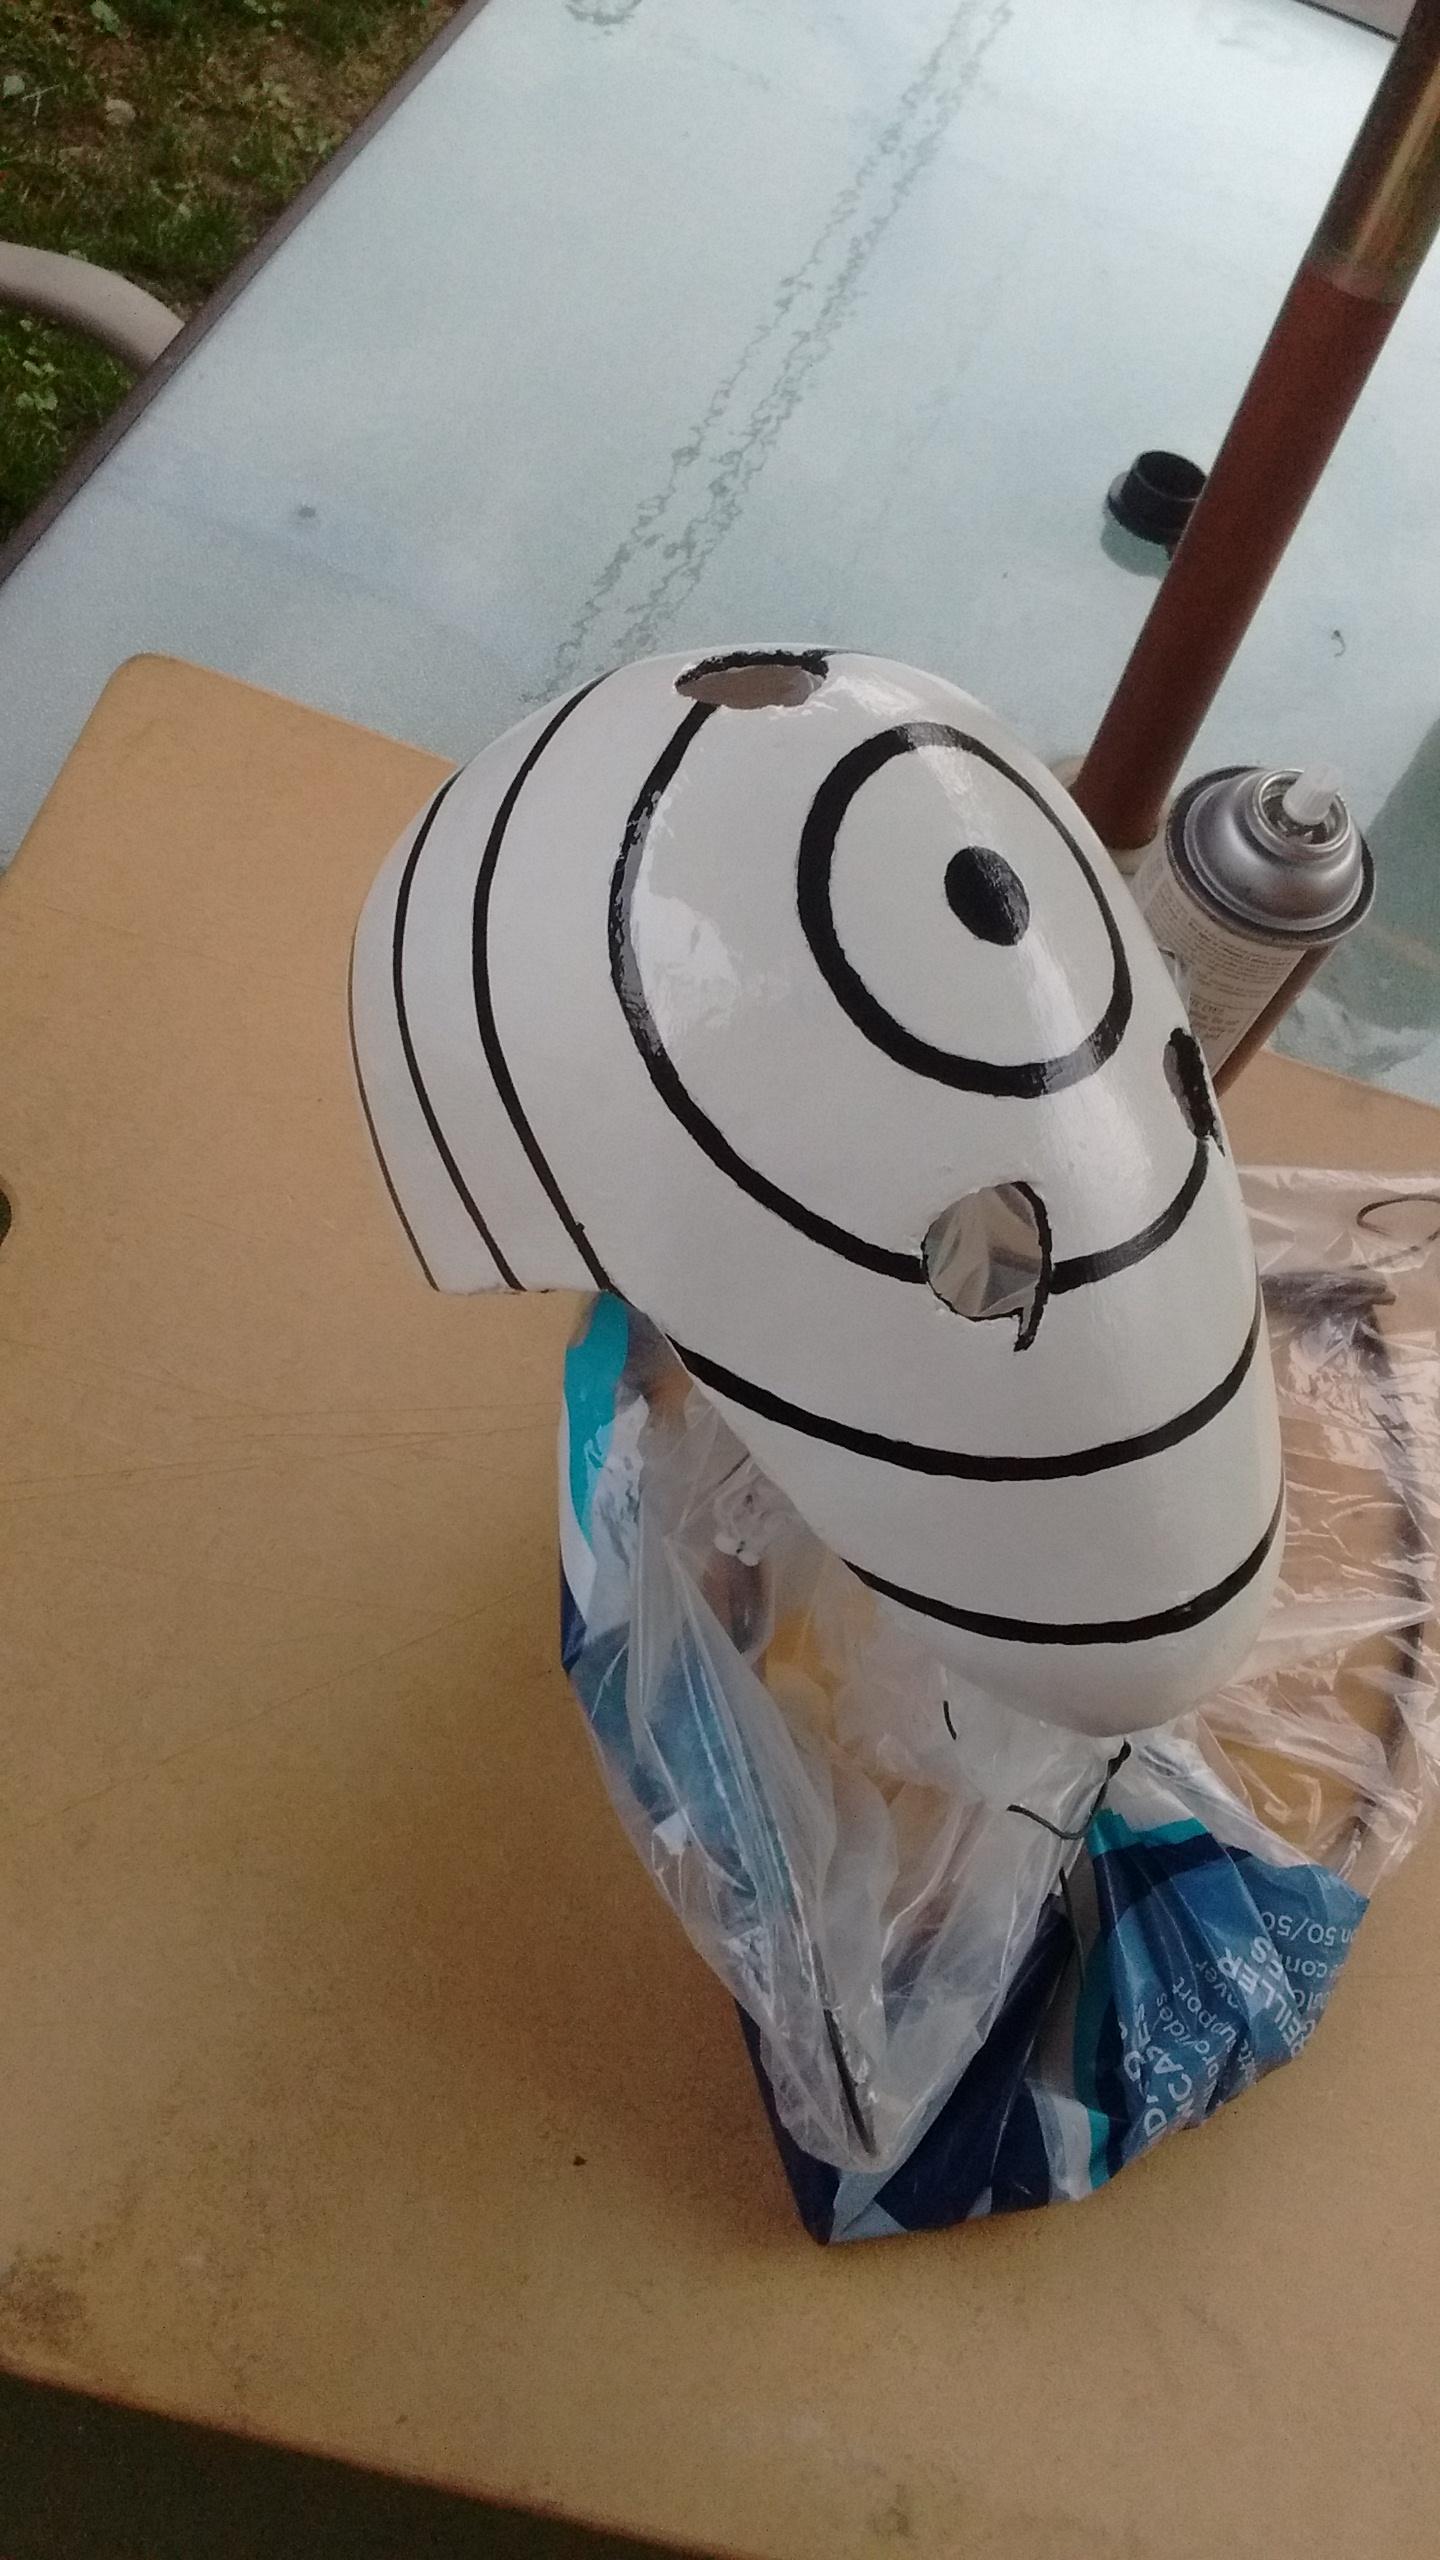 Obito Uchiha Rinnegan Mask Prop